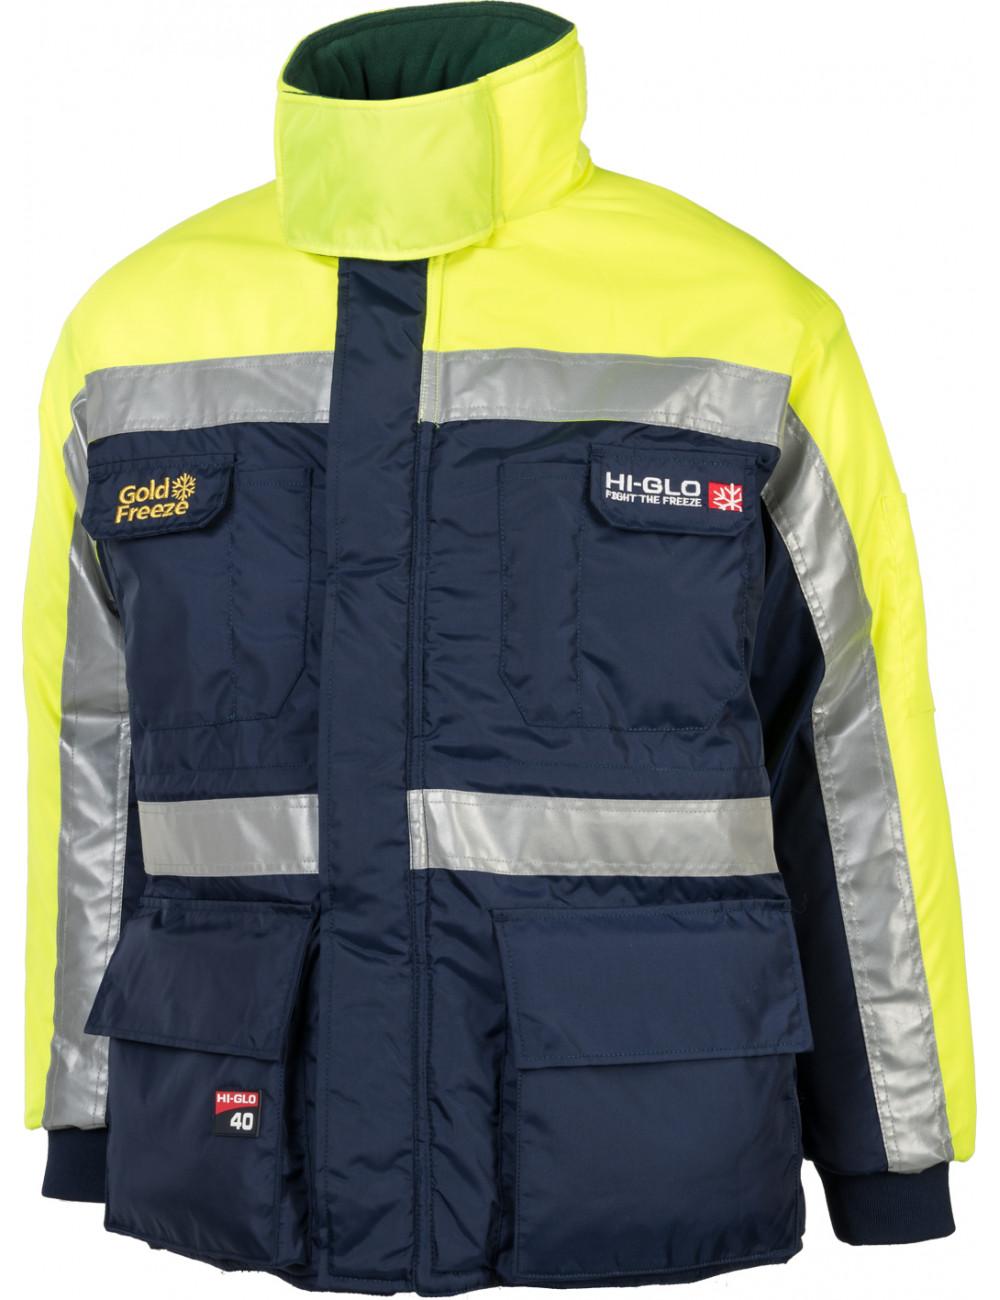 Kurta do mroźni Hi-Glo 40 Freezer Jacket